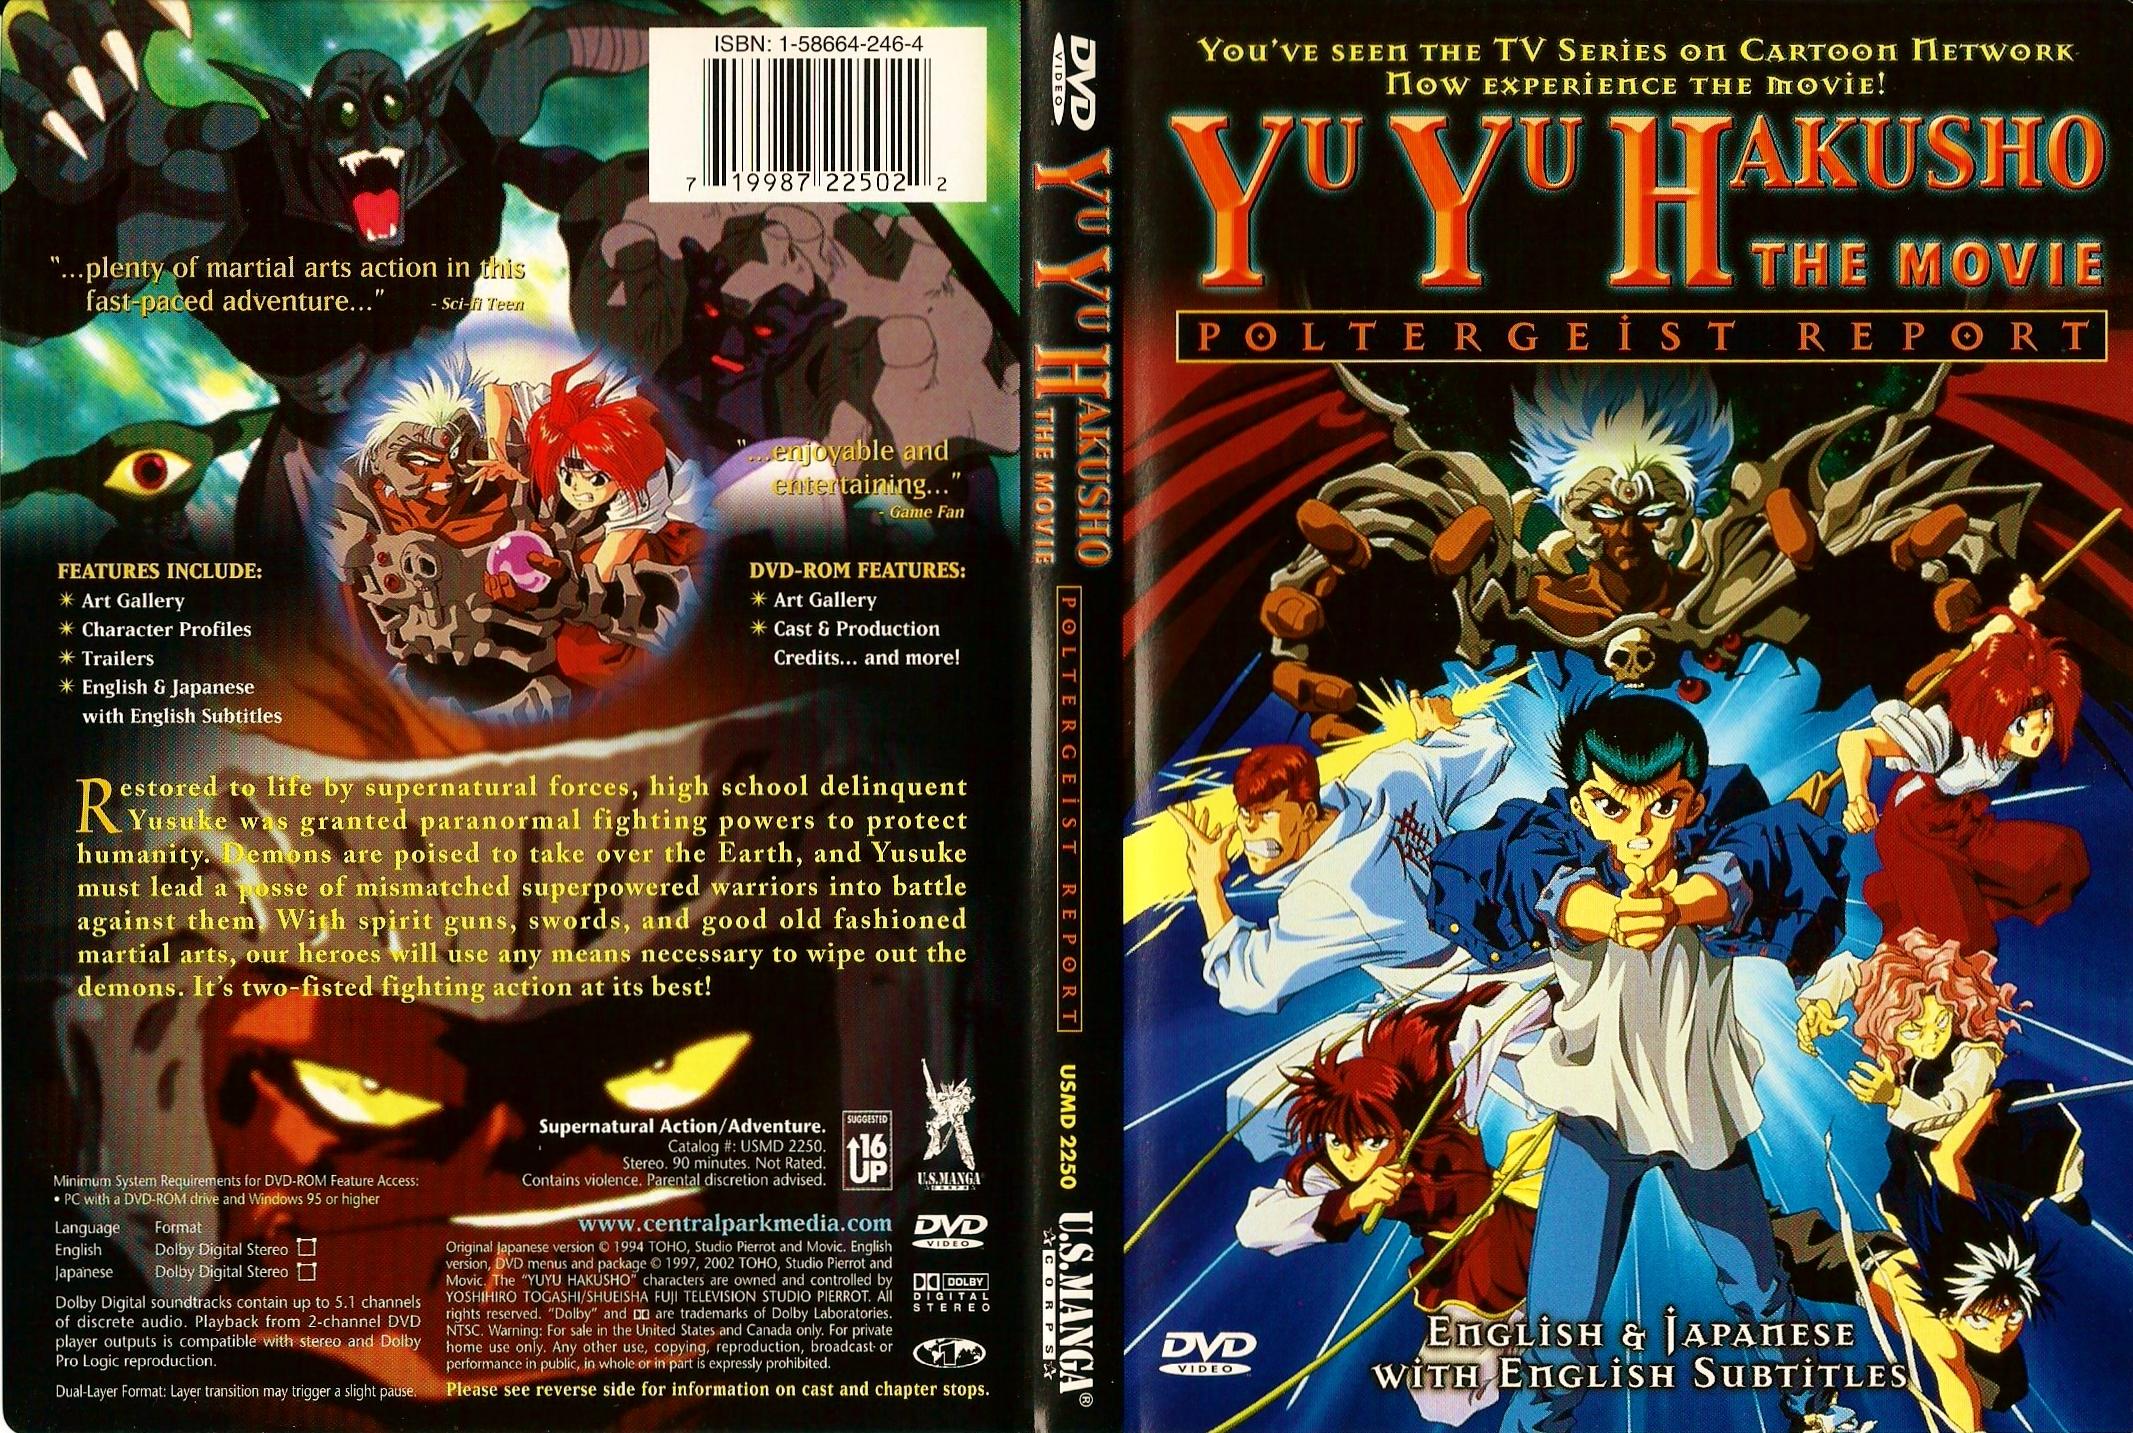 Covers Box Sk Yu Yu Hakusho The Movie Poltergeist Report High Quality Dvd Blueray Movie